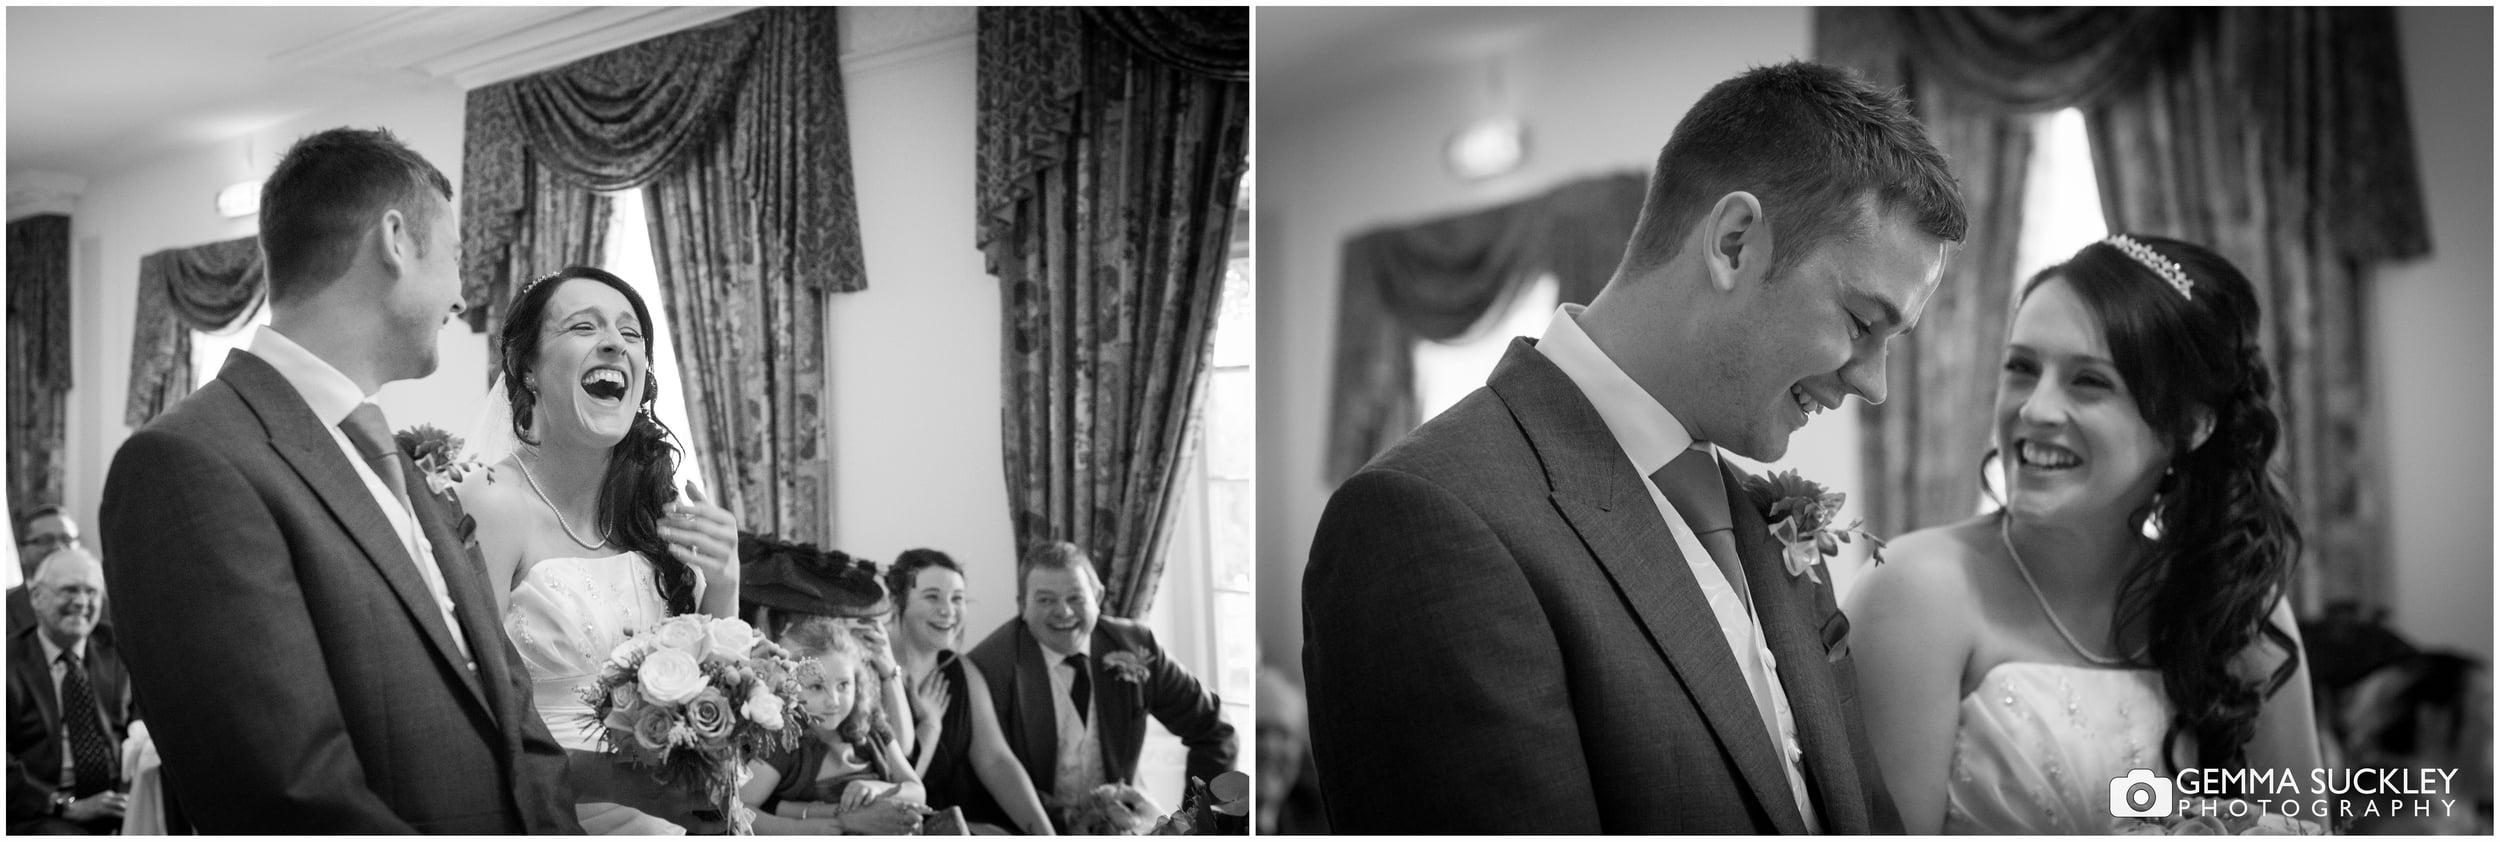 baildon-hoyle-court-wedding.jpg